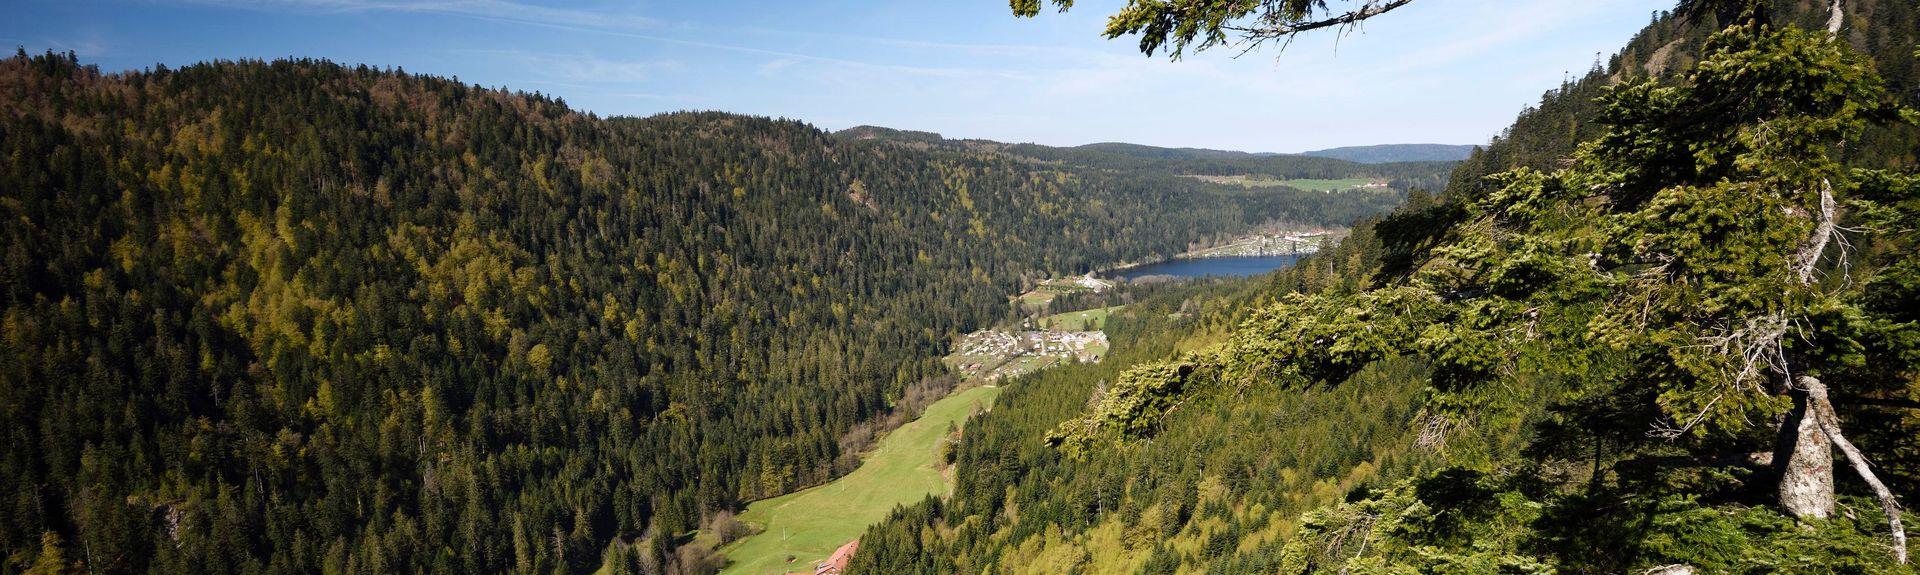 Xonrupt-Longemer, Vosges (departementti), Ranska